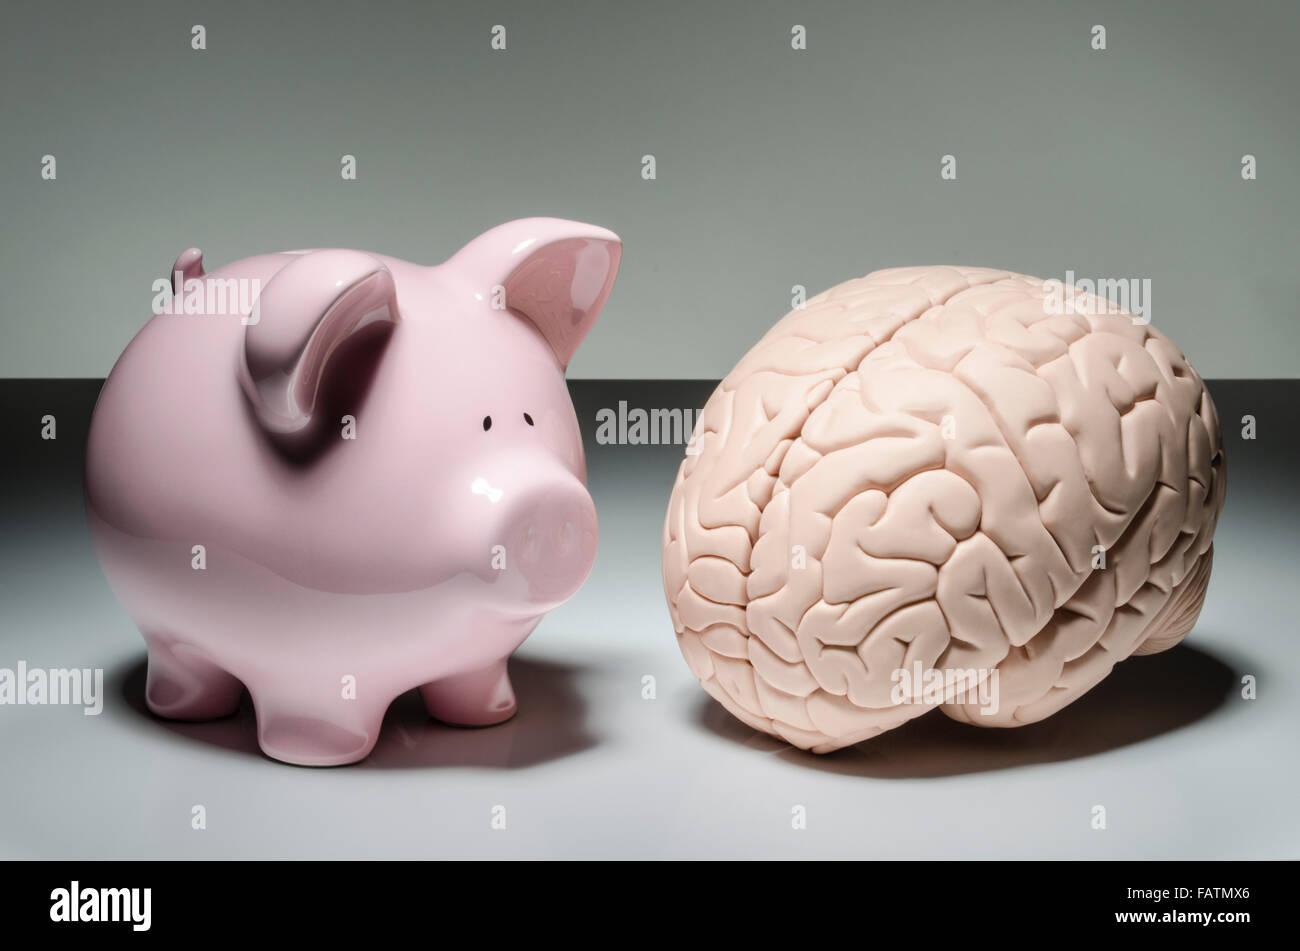 how is piggy intelligent